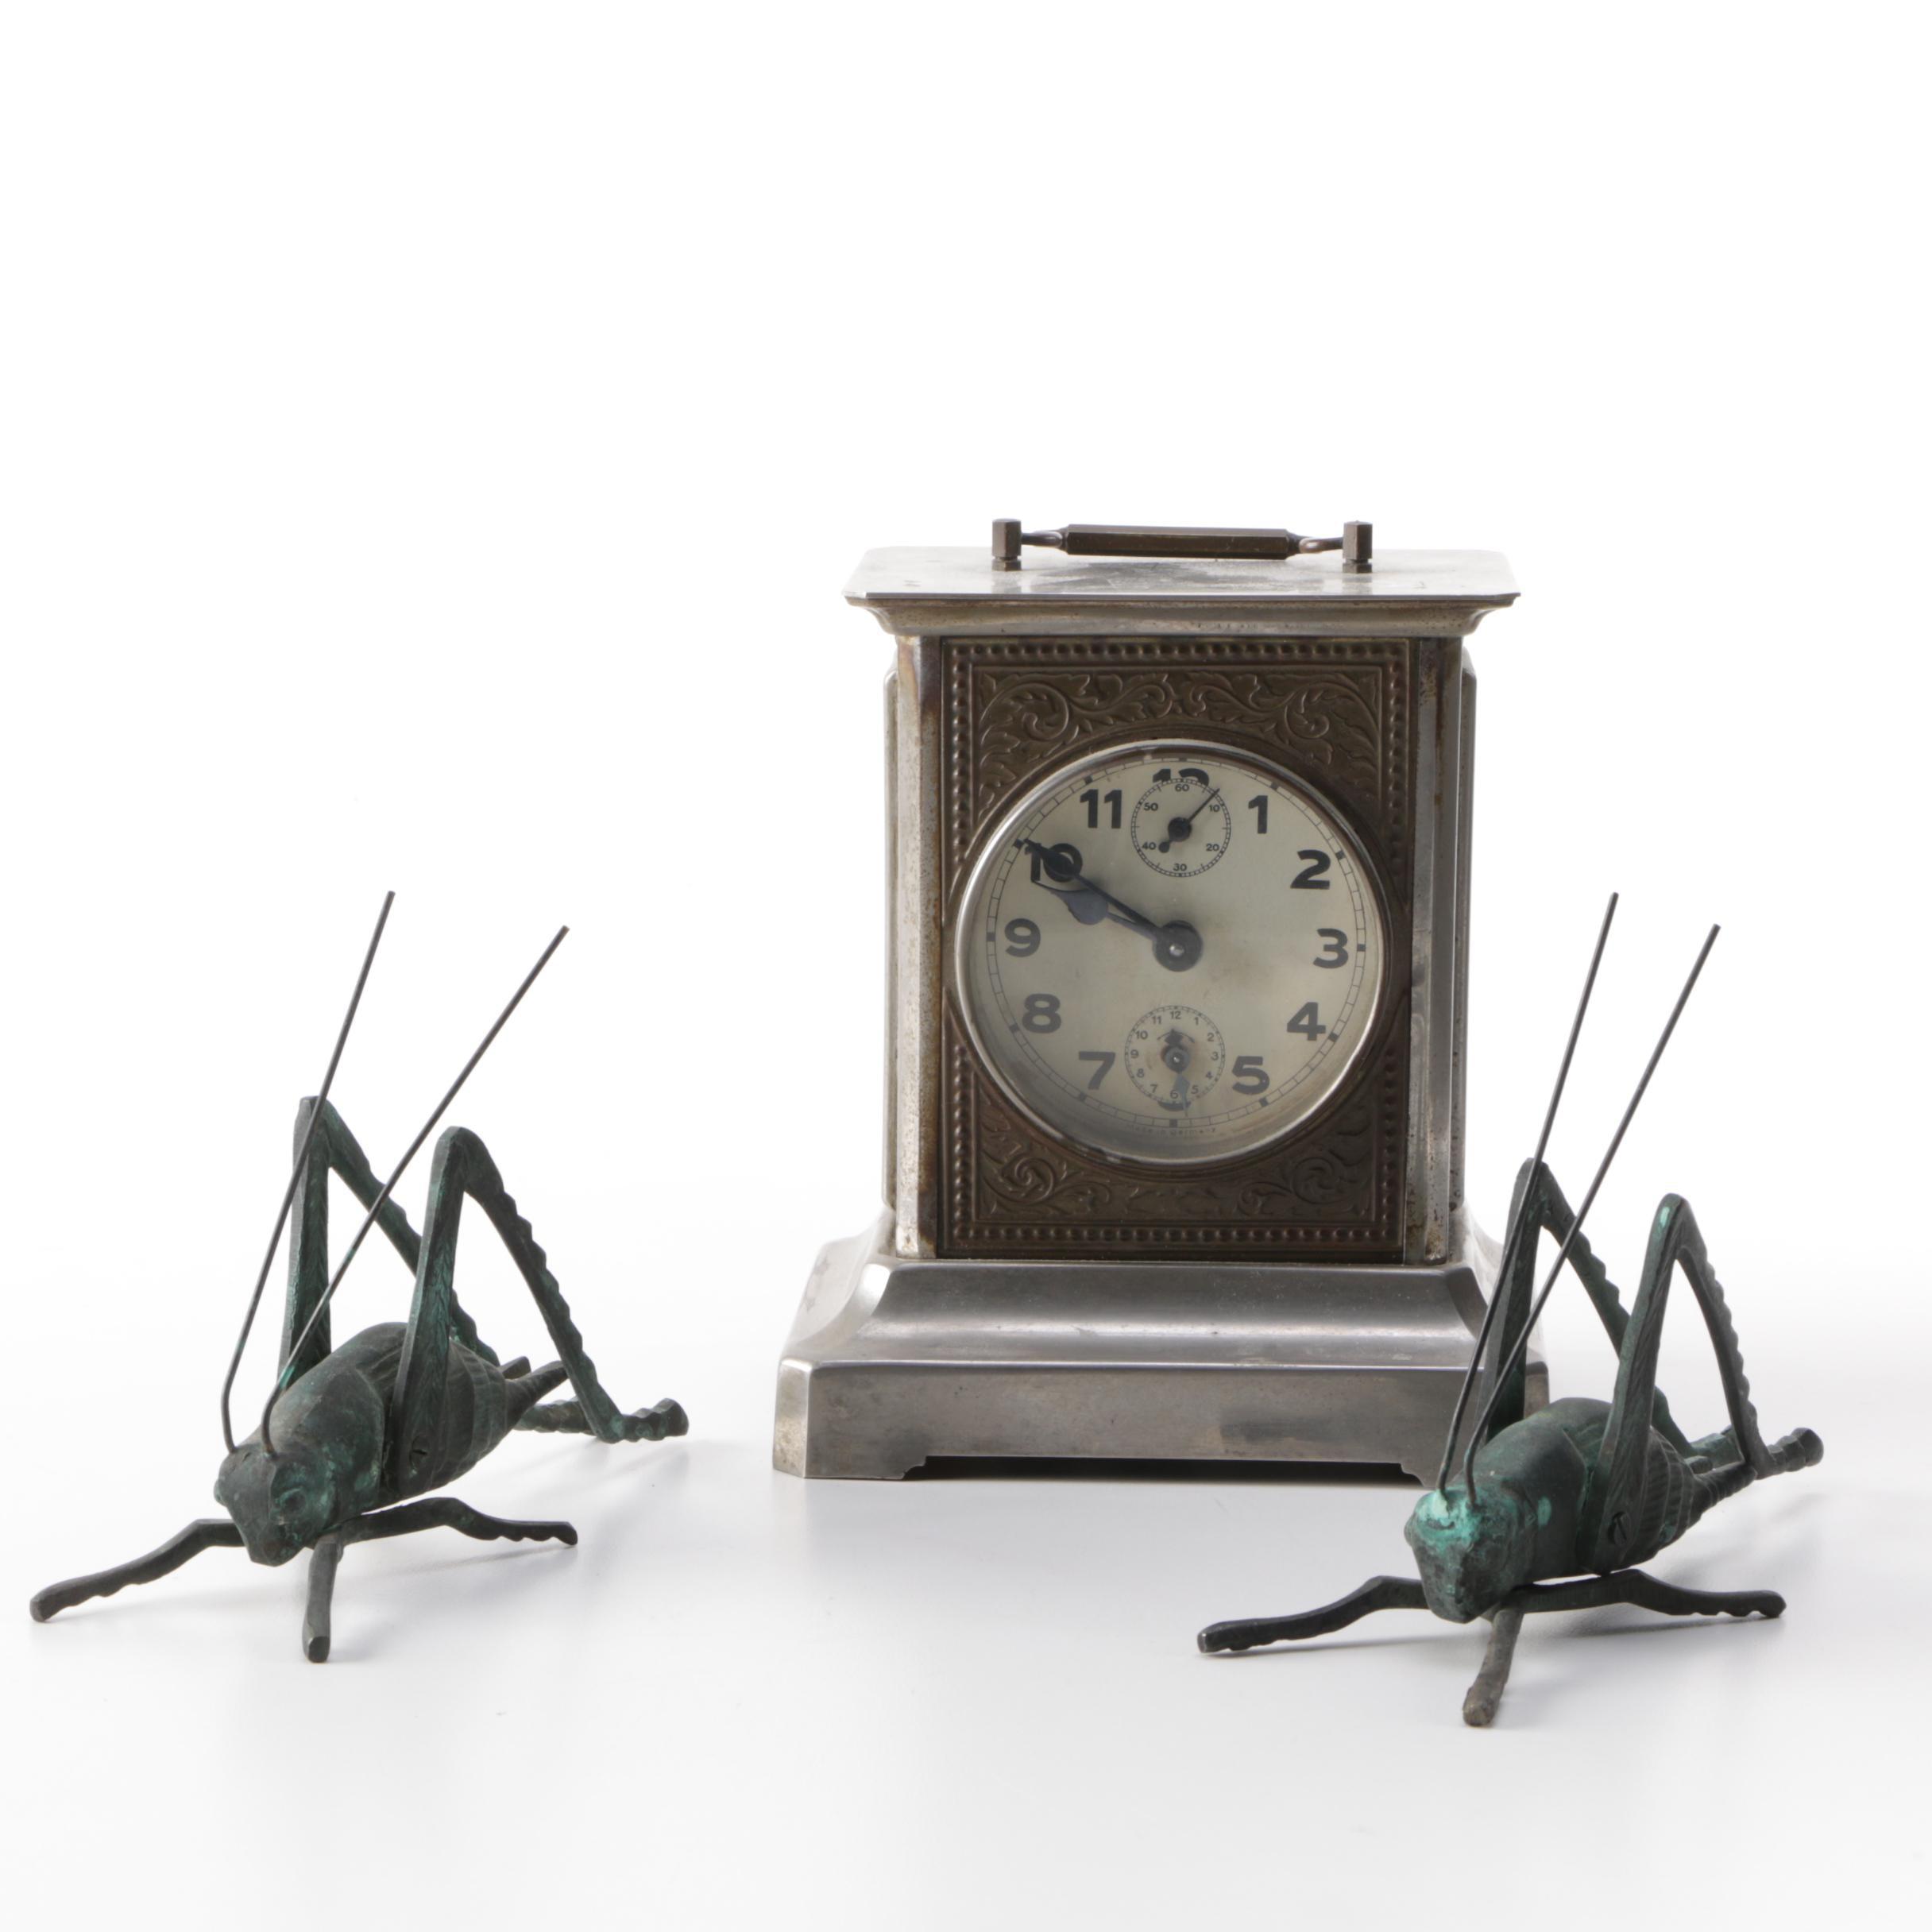 F. Mauthe Mantel Music Box Alarm Carriage Clock